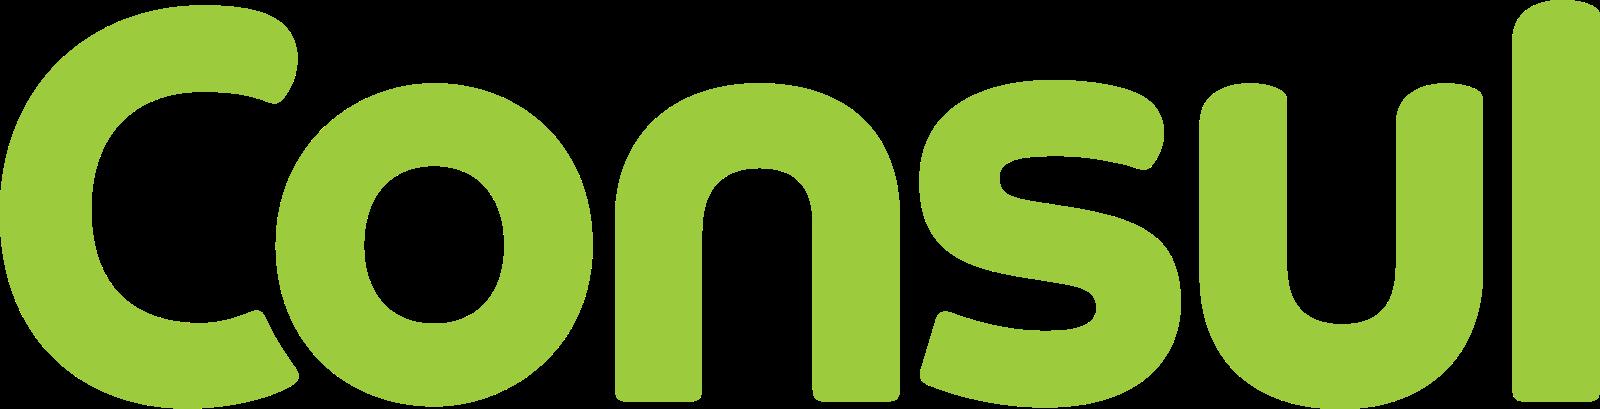 consul logo png e vetor download de logotipos